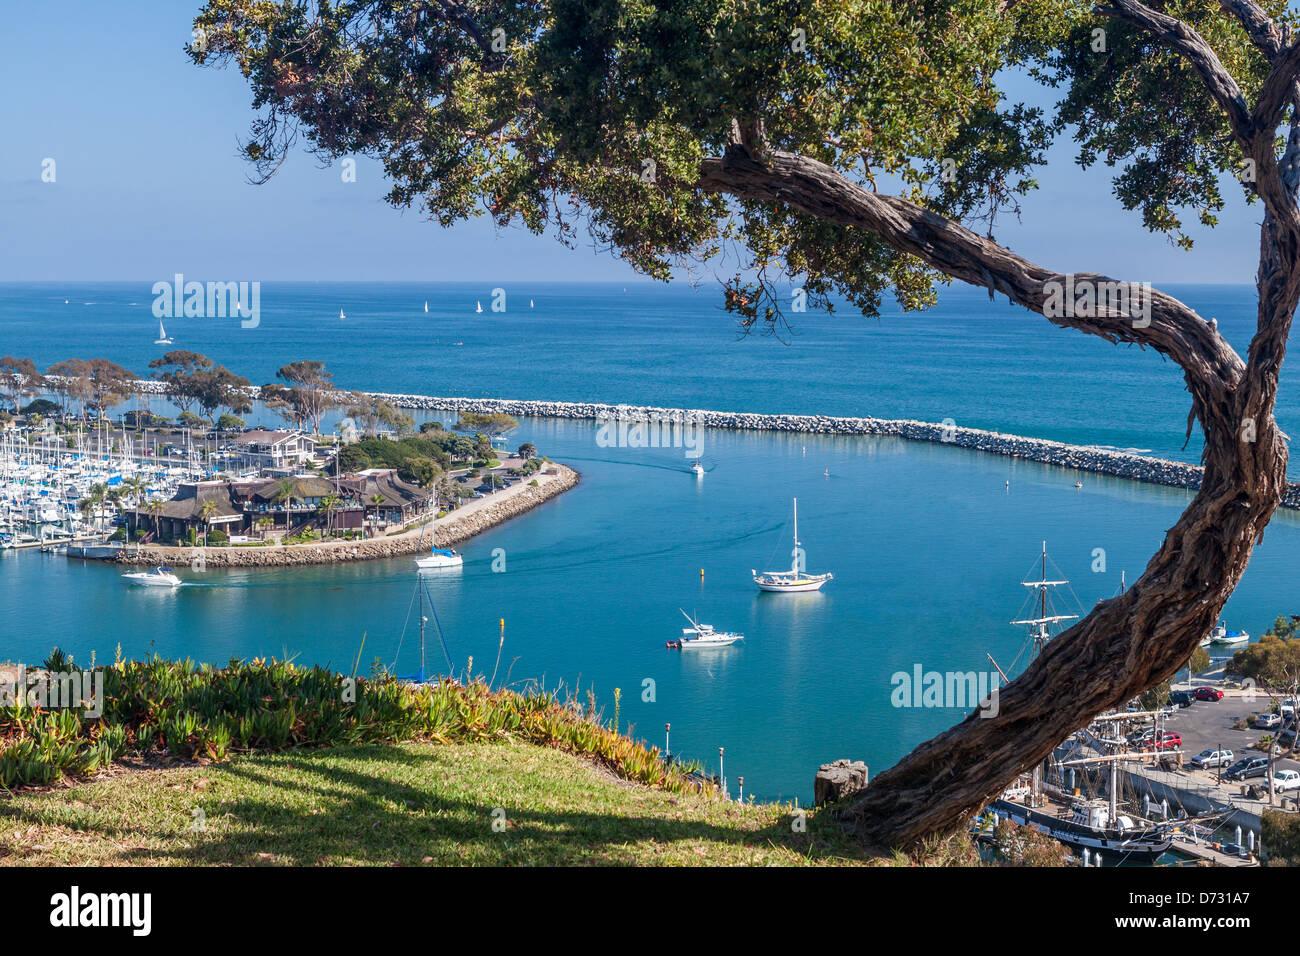 Dana Point Harbor, California - Stock Image